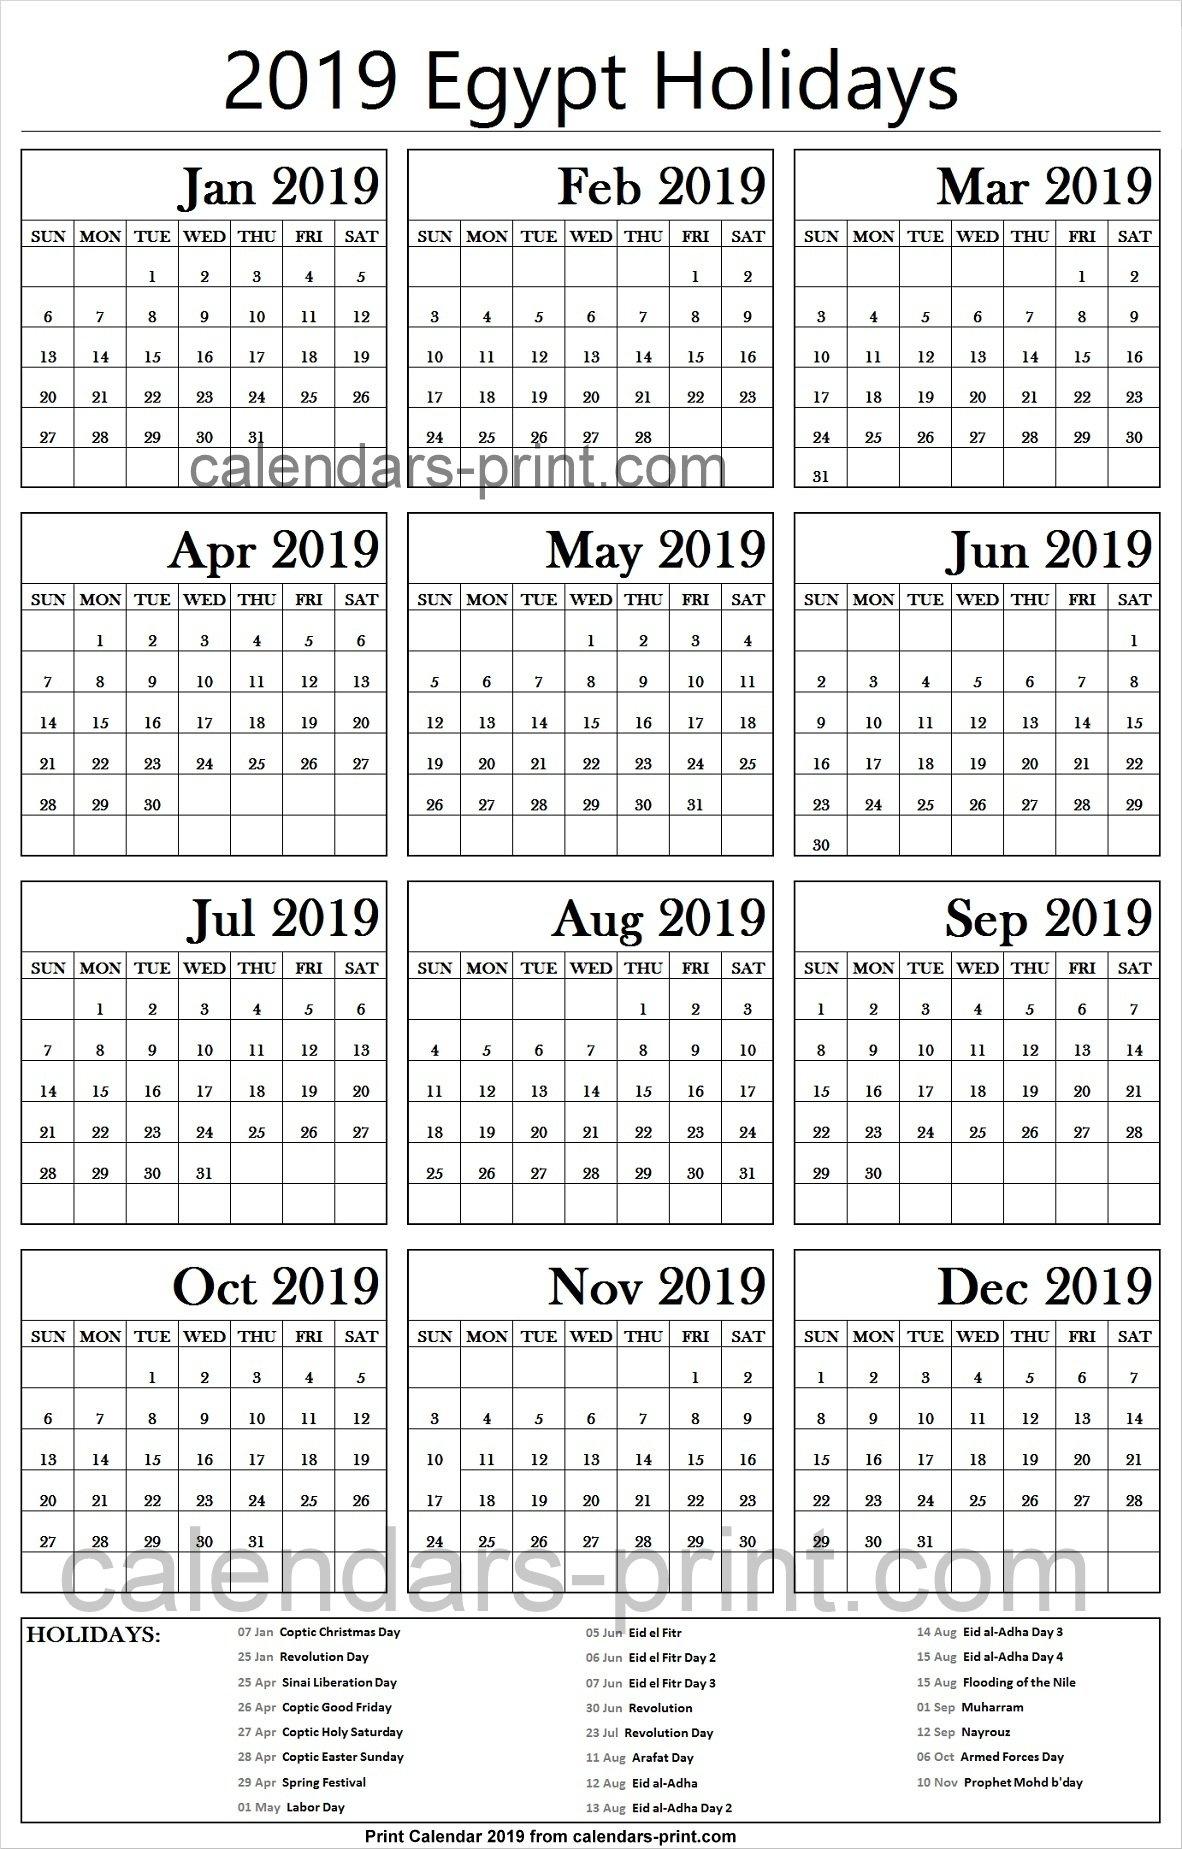 2019 Bank Holidays Egypt Calendar | 2019 Egypt Calendar Template Calendar 2019 Bank Holidays